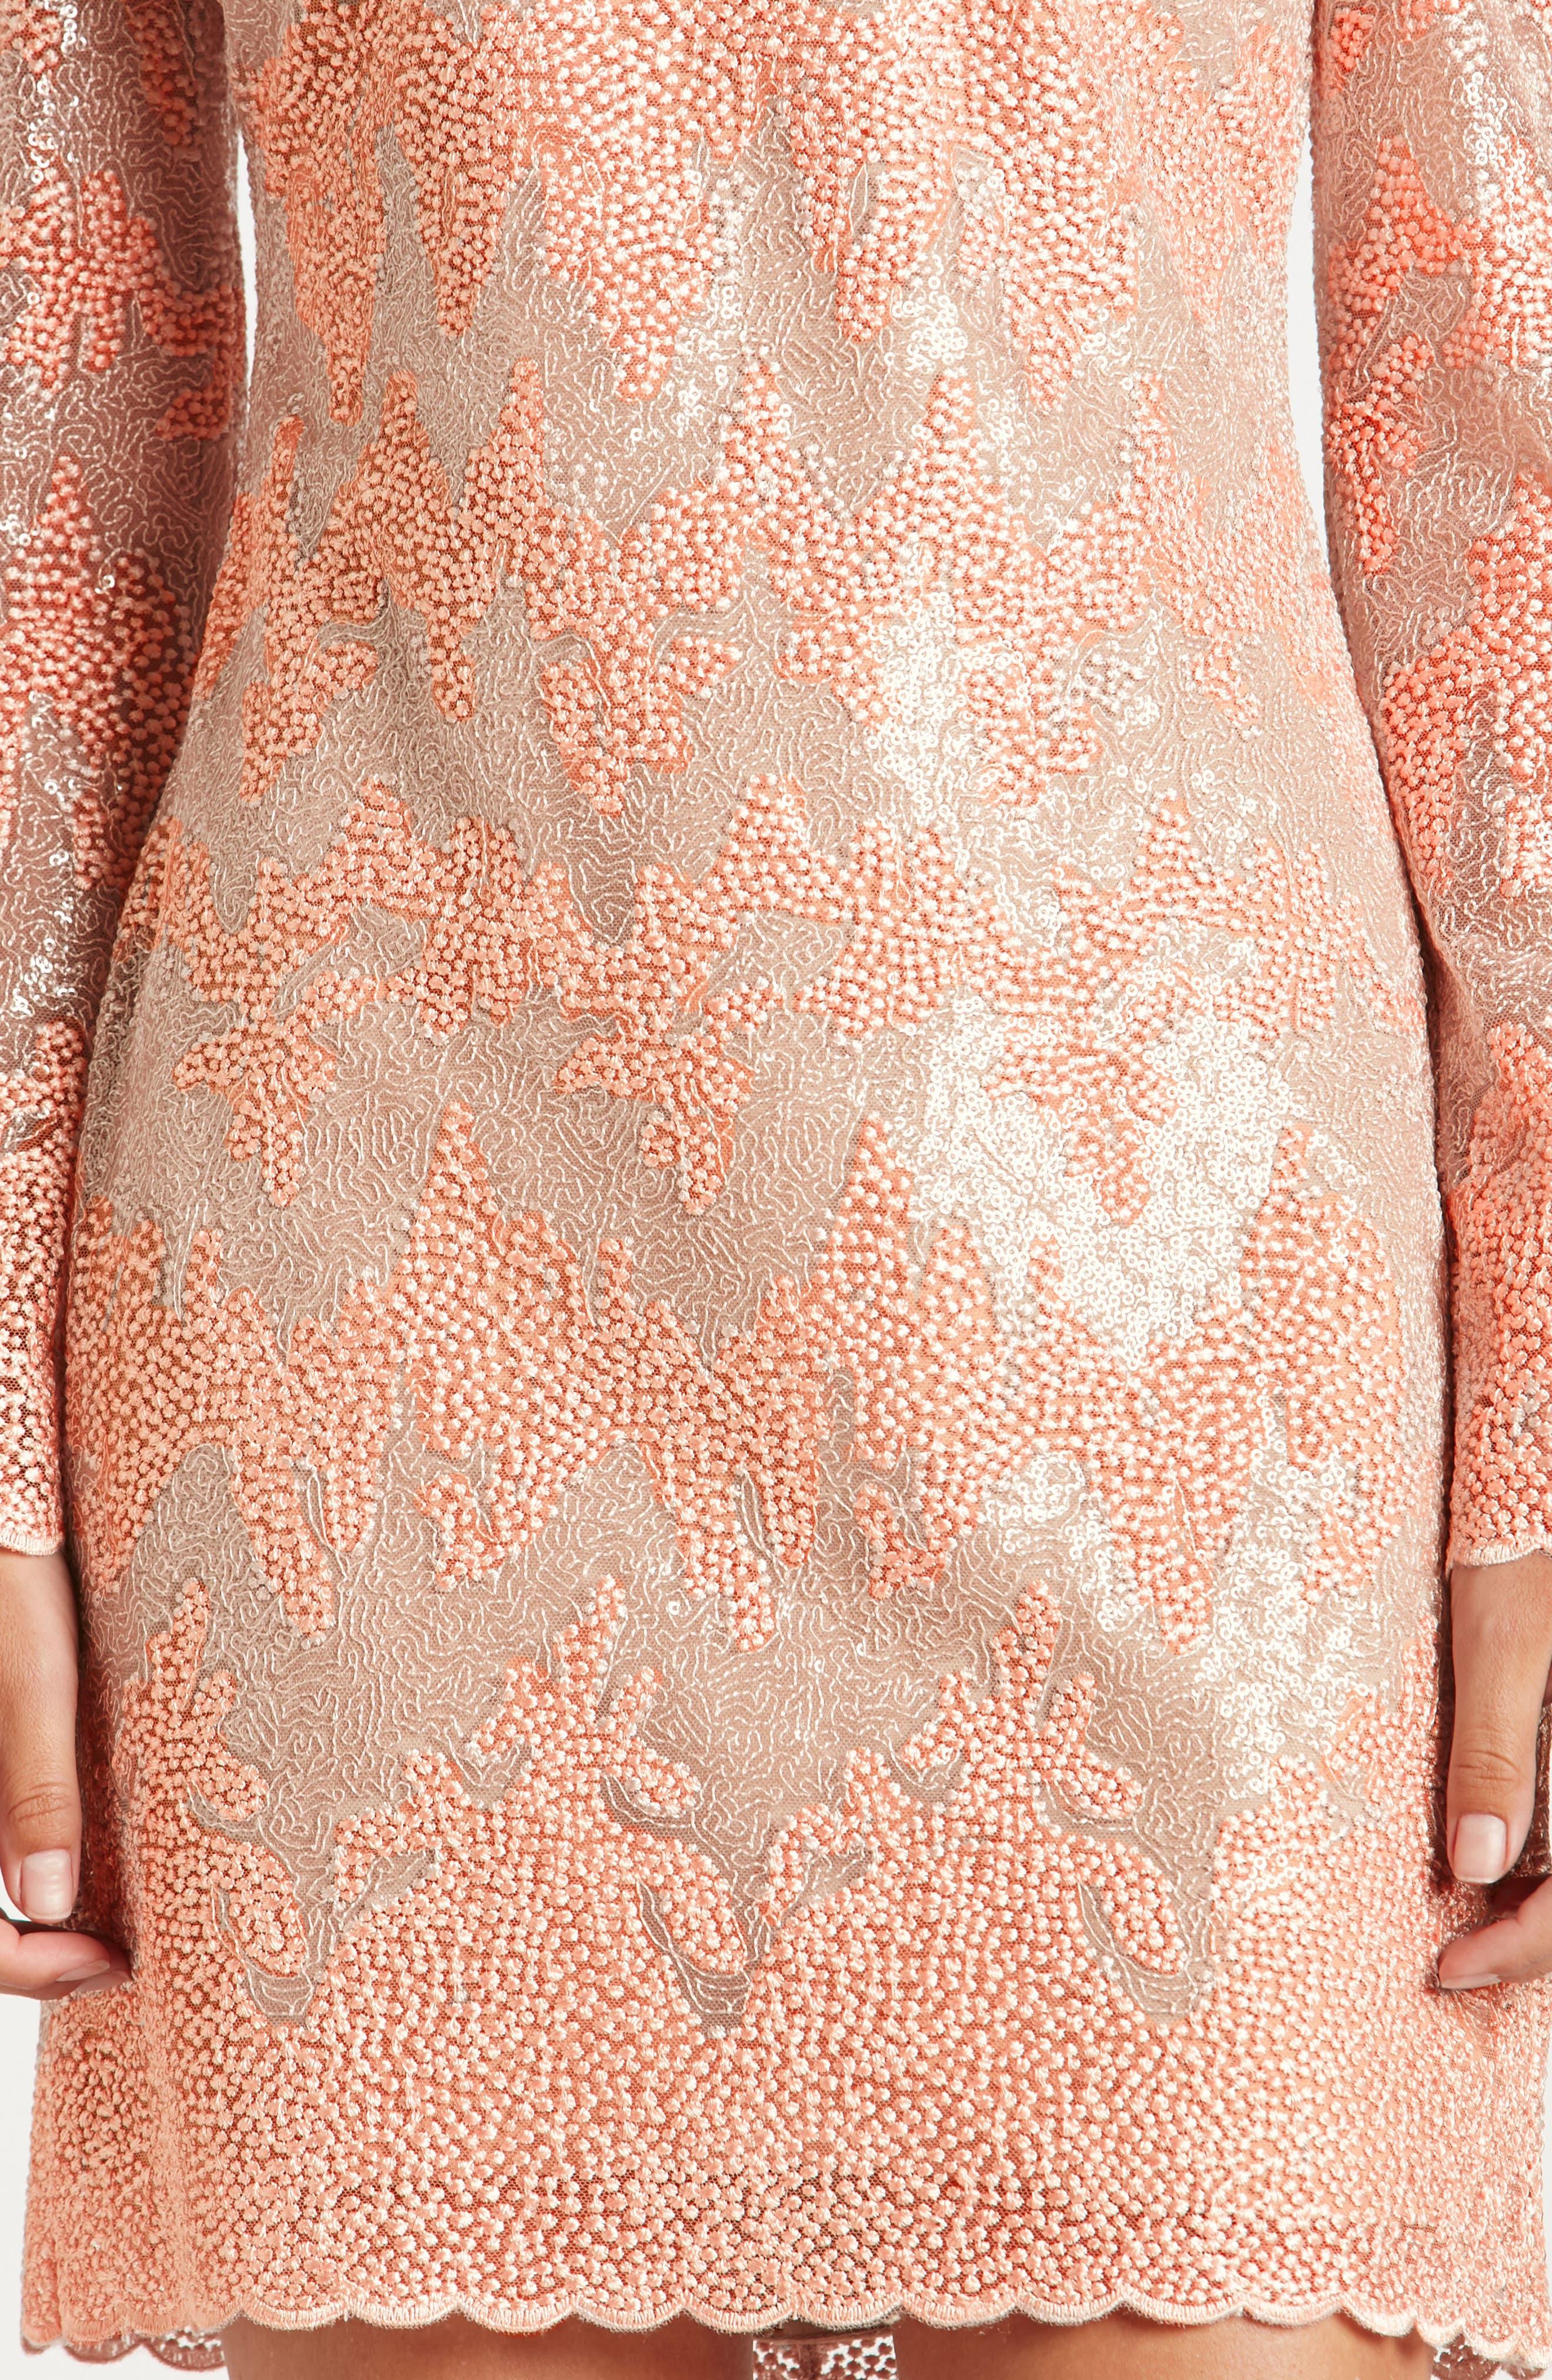 Aubry Sequin Embellished Shift Dress,                             Alternate thumbnail 4, color,                             686